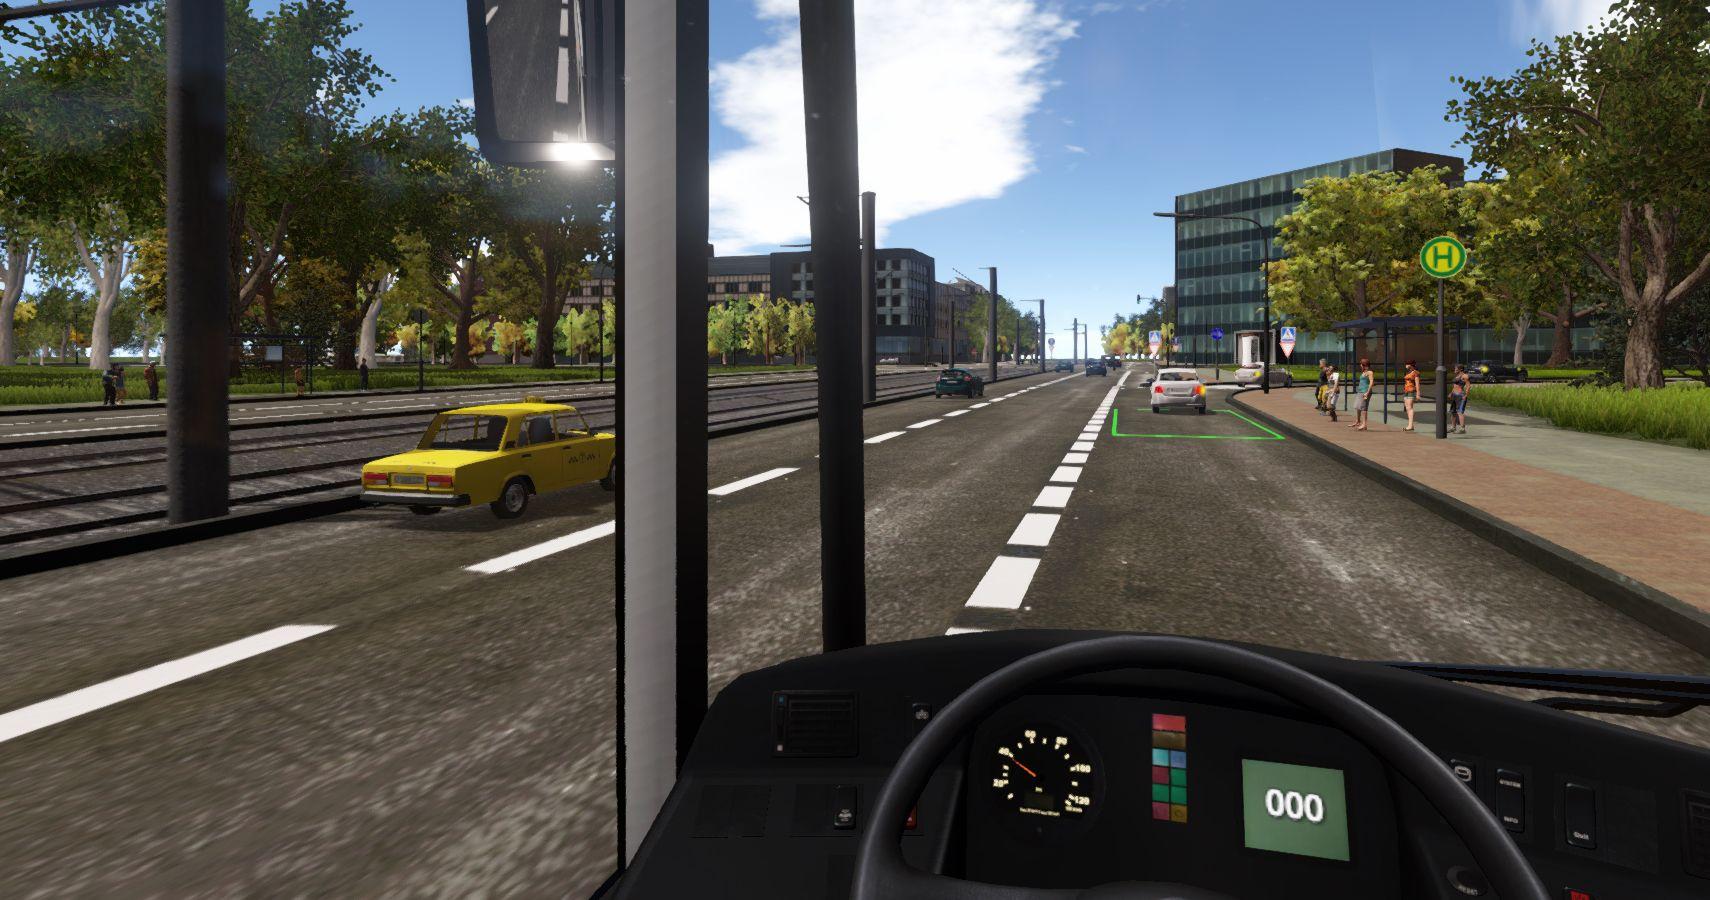 Bus Simulator 2019 Review Ps4 Thegamer